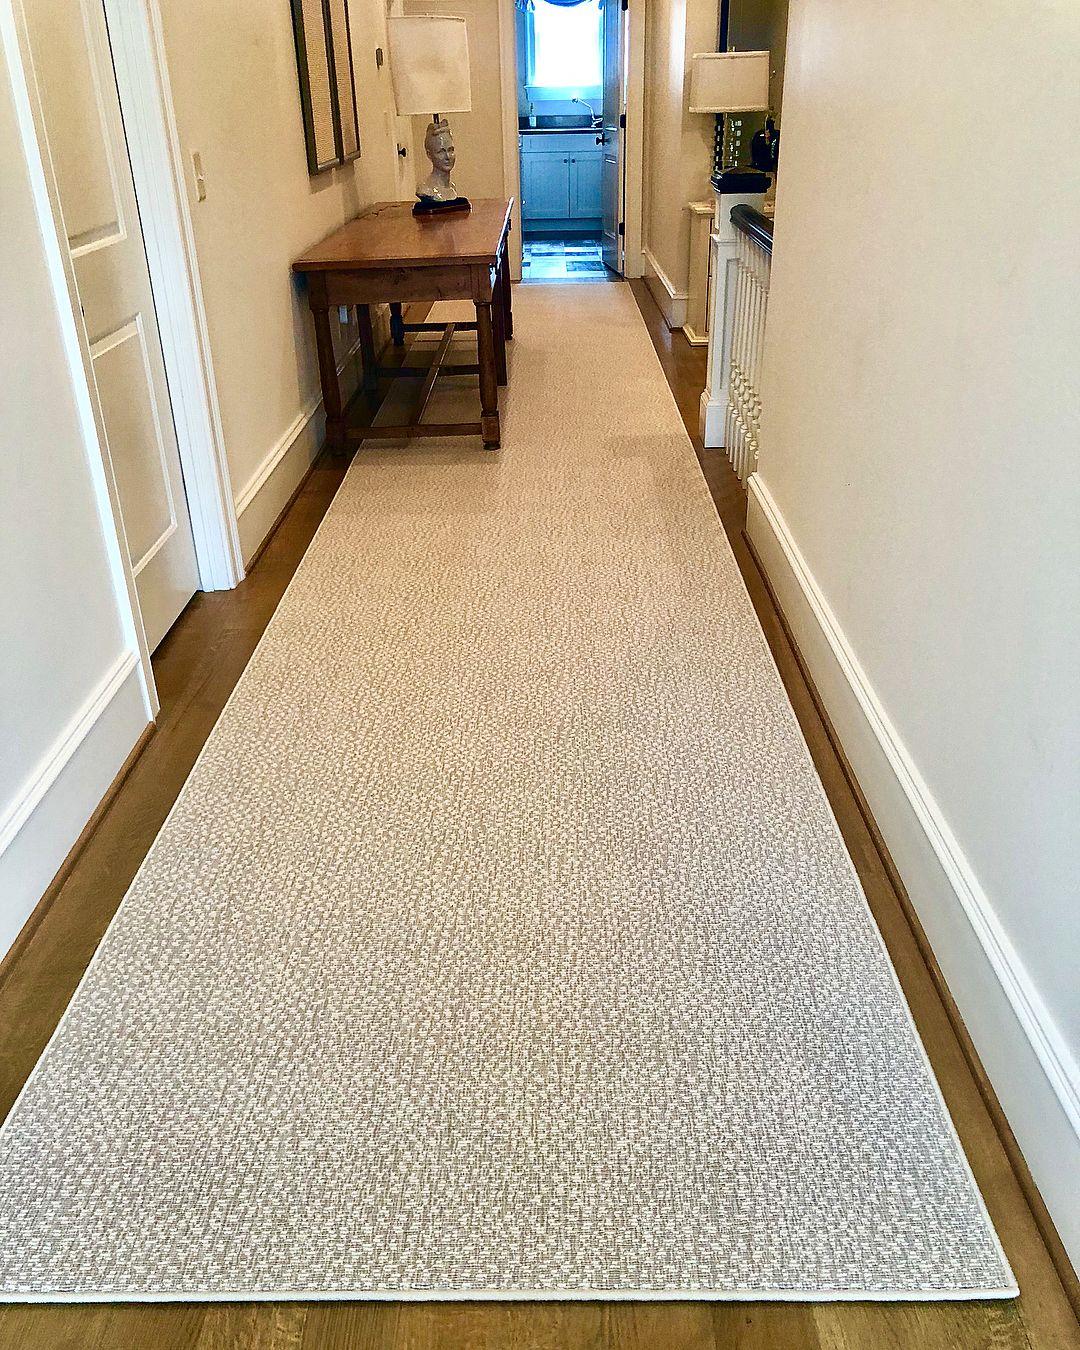 Stark Custom Hall And Stair Runner Starkkubra Stairs Hallways | Stair And Hallway Runners | Landing | Stair Treads | Wool | Non Slip | Images Tagged